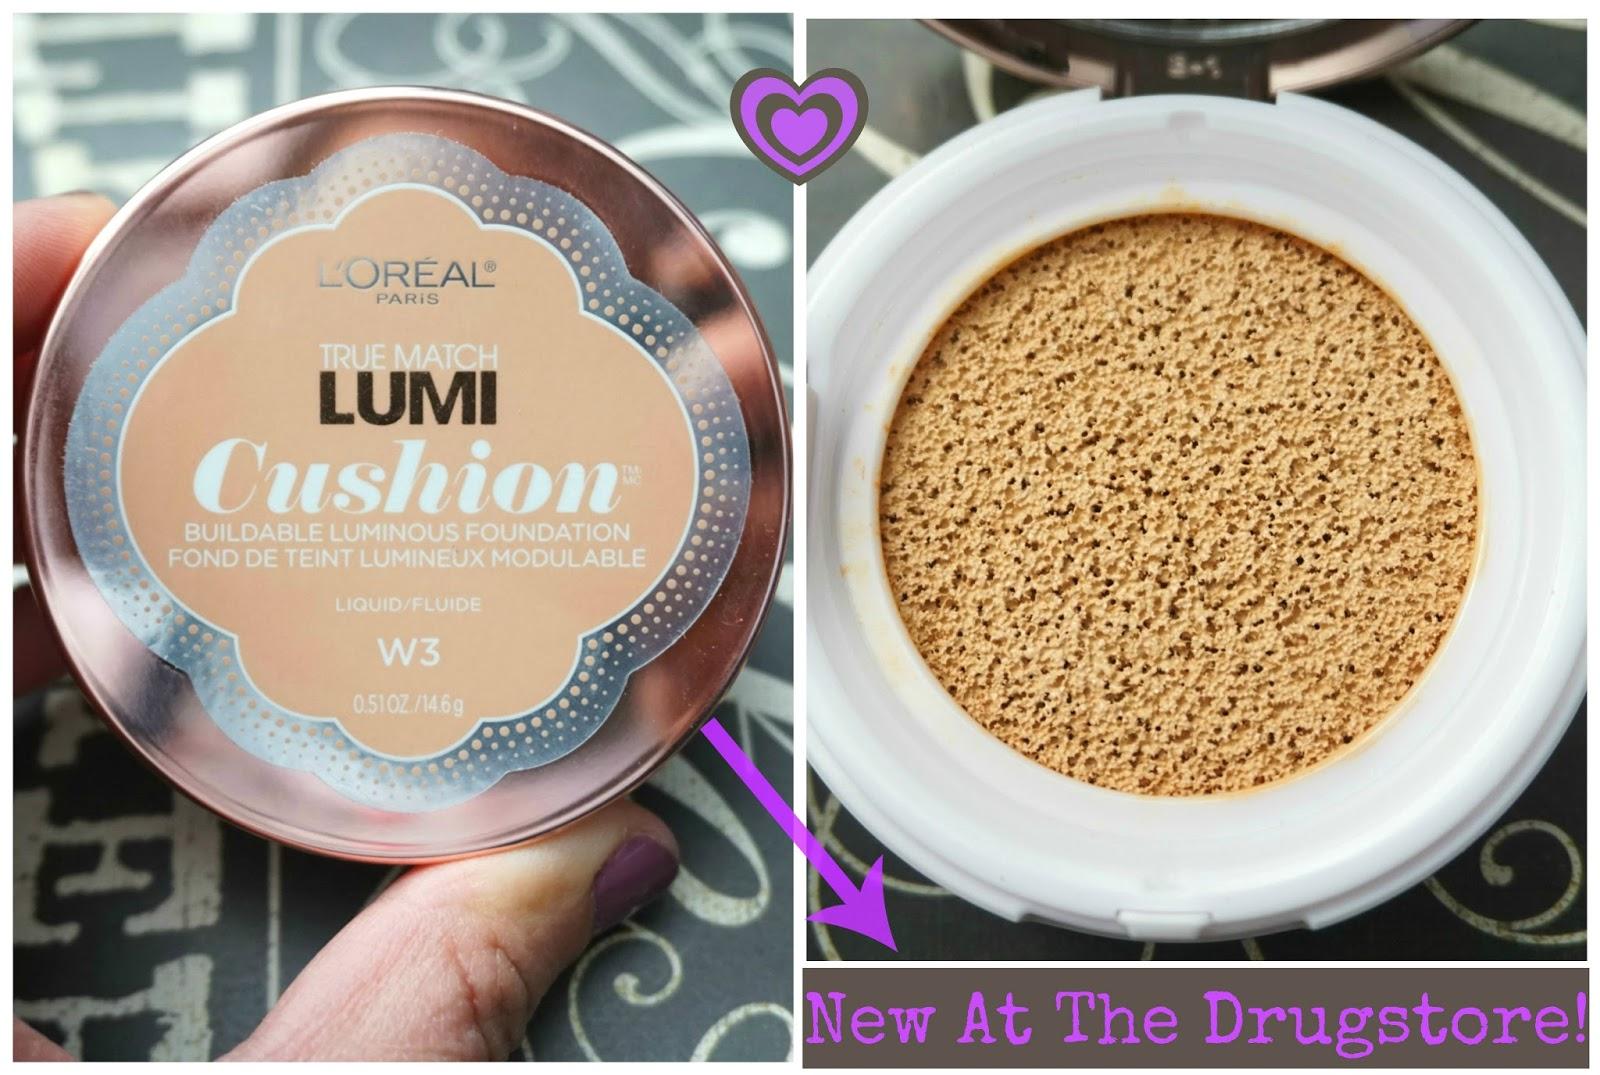 Makeup Fashion Royalty Review Loreal True Match Lumi Cushion Buildable Luminous Foundation